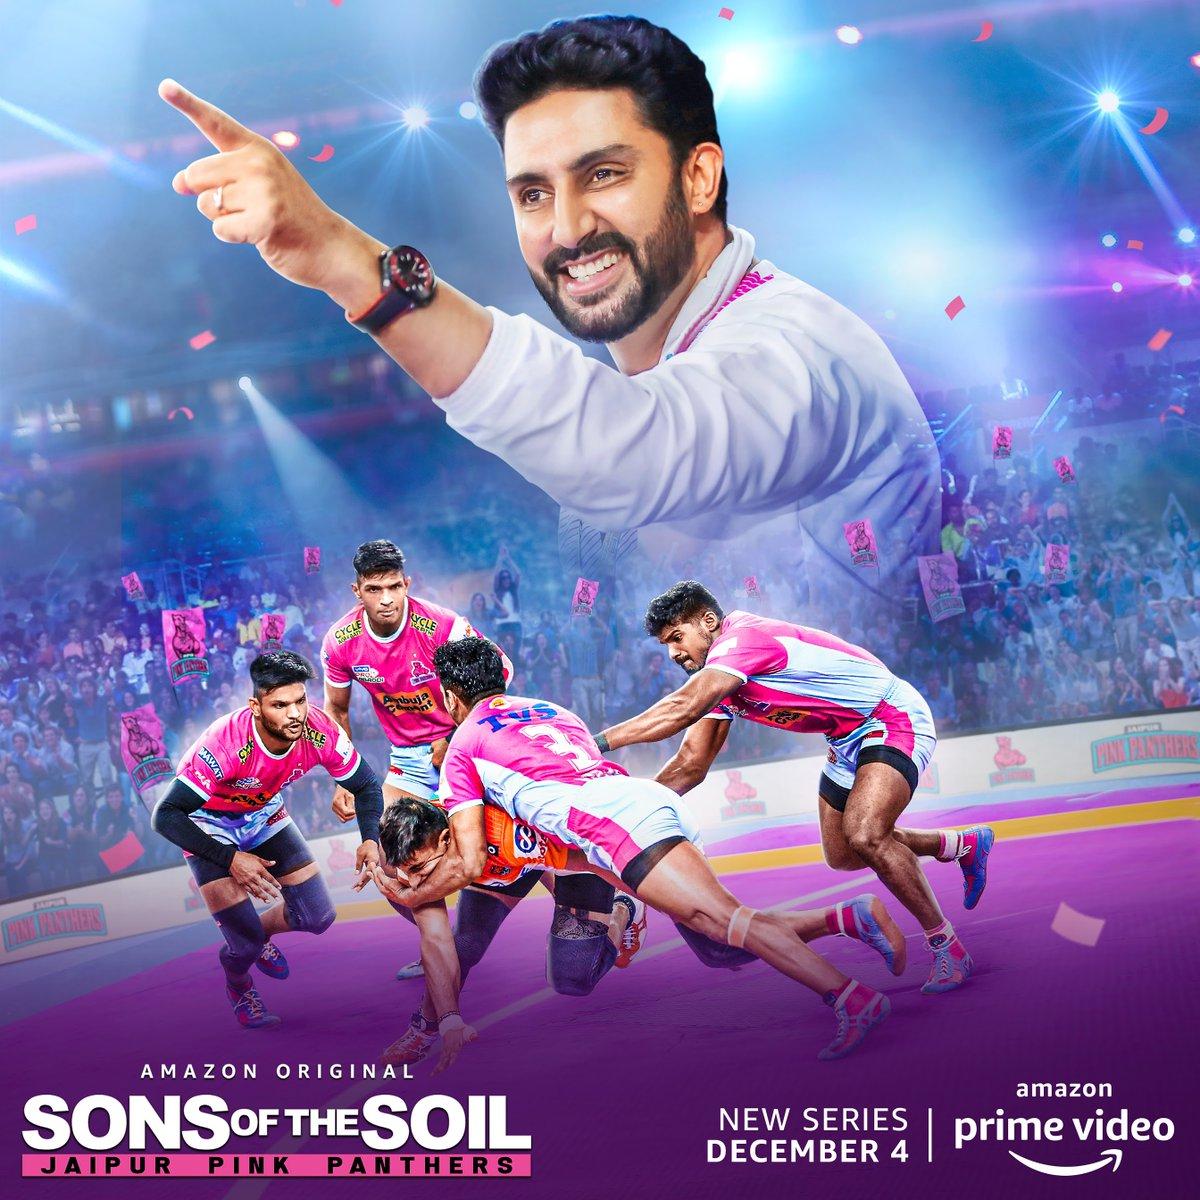 Jitne buland team ke hausle hain, utni hi yadgaar hai iss team ki kahaani. #SonsOfTheSoil Trailer Out Tomorrow, on @PrimeVideoIN  @juniorbachchan @bunty_walia @JaipurPanthers @DeepakHooda5555 @nitinrkabaddi